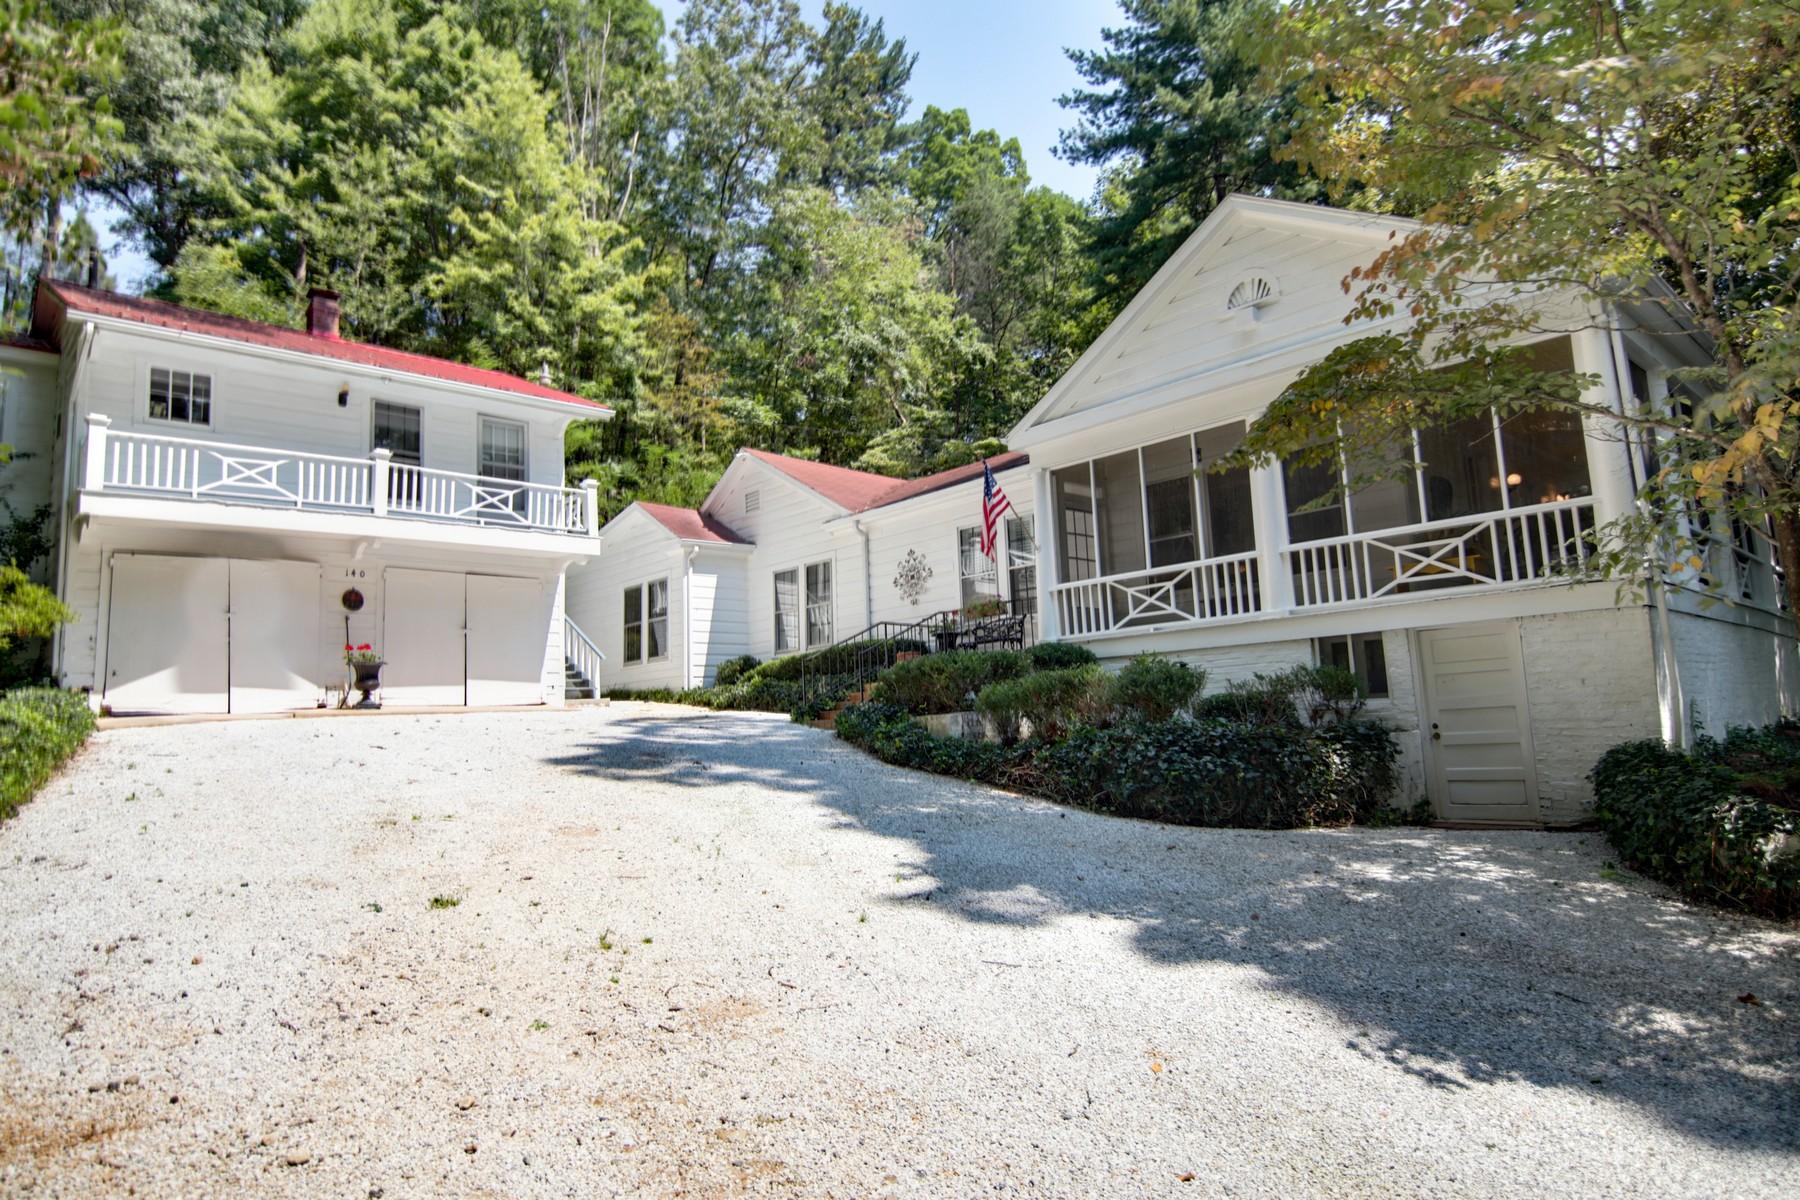 Single Family Home for Sale at 140 Harris Road Lake Lure, North Carolina, 28746 United States